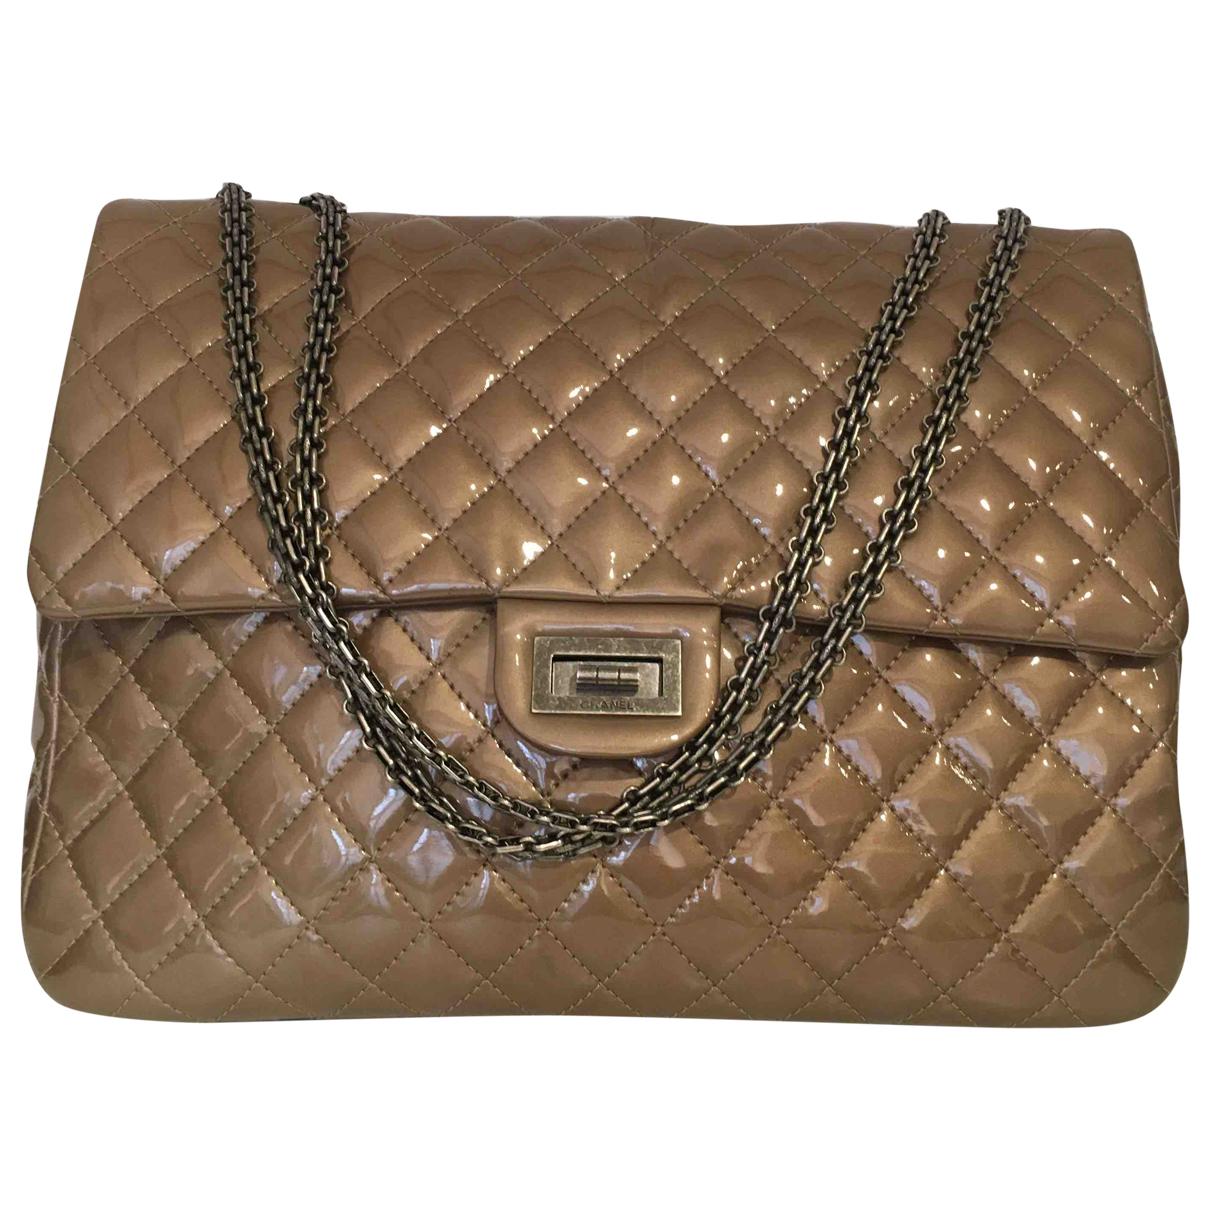 Chanel 2.55 Beige Patent leather handbag for Women \N